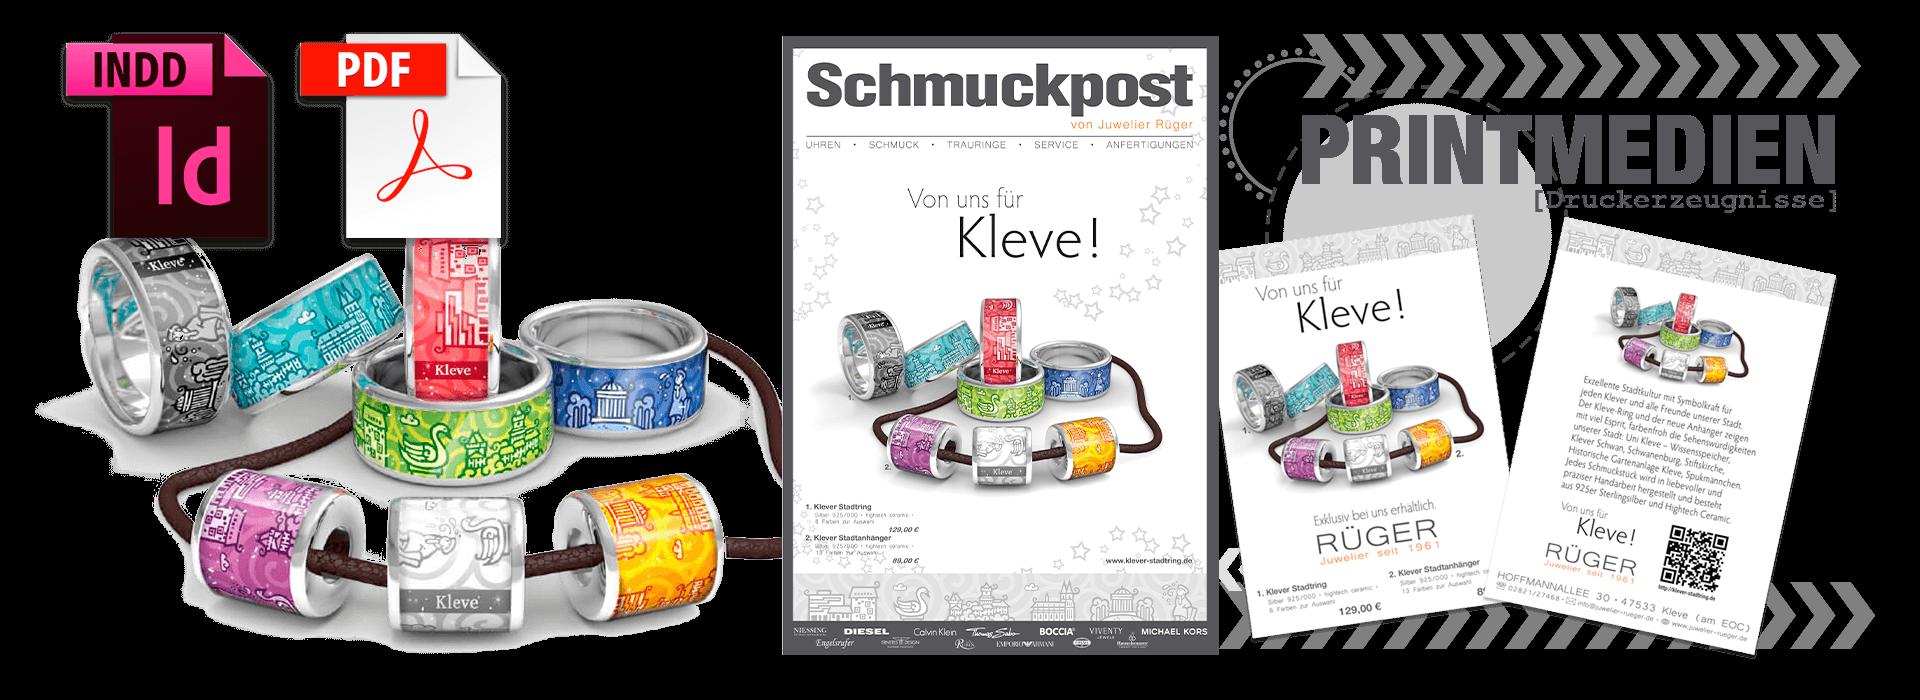 Titelbilder-Flyer-A4-Klever-Stadtring-juwelier-rueger-kleve